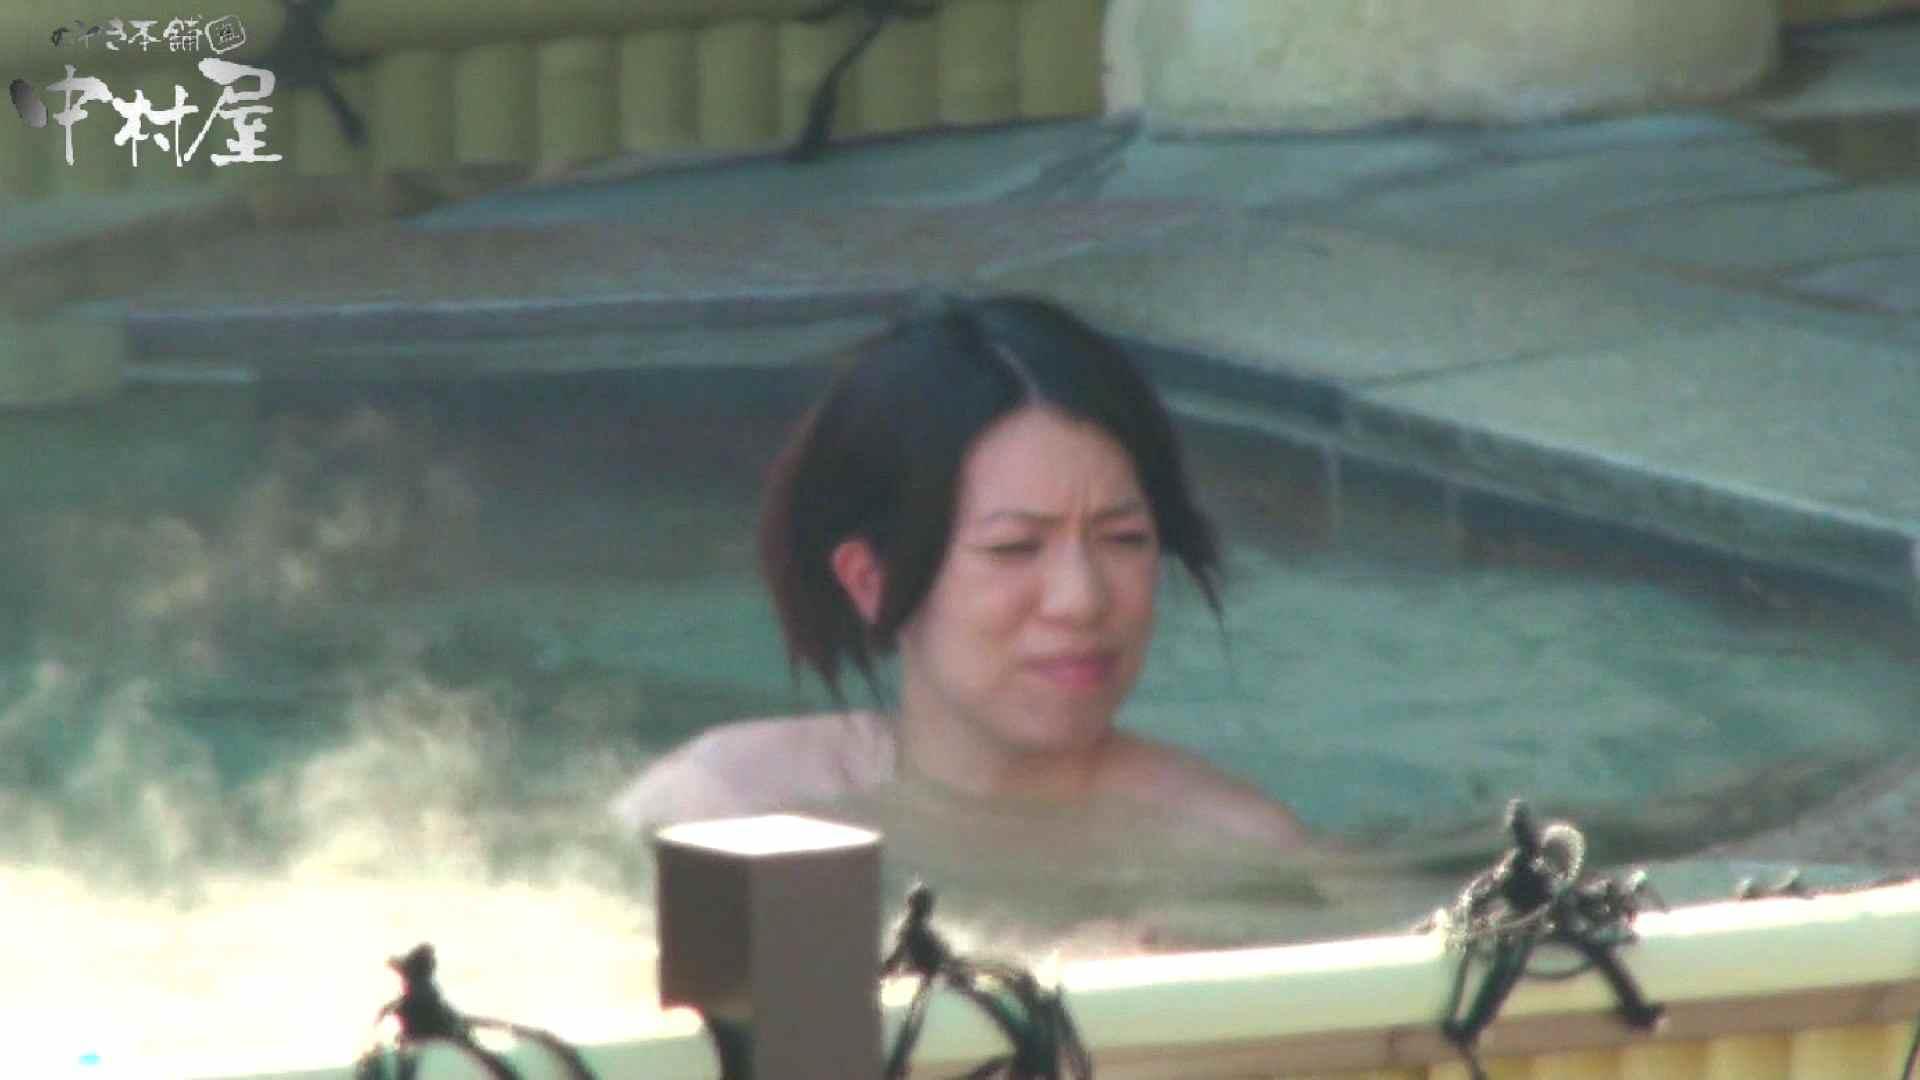 Aquaな露天風呂Vol.919 OLのエロ生活   露天風呂  91連発 52